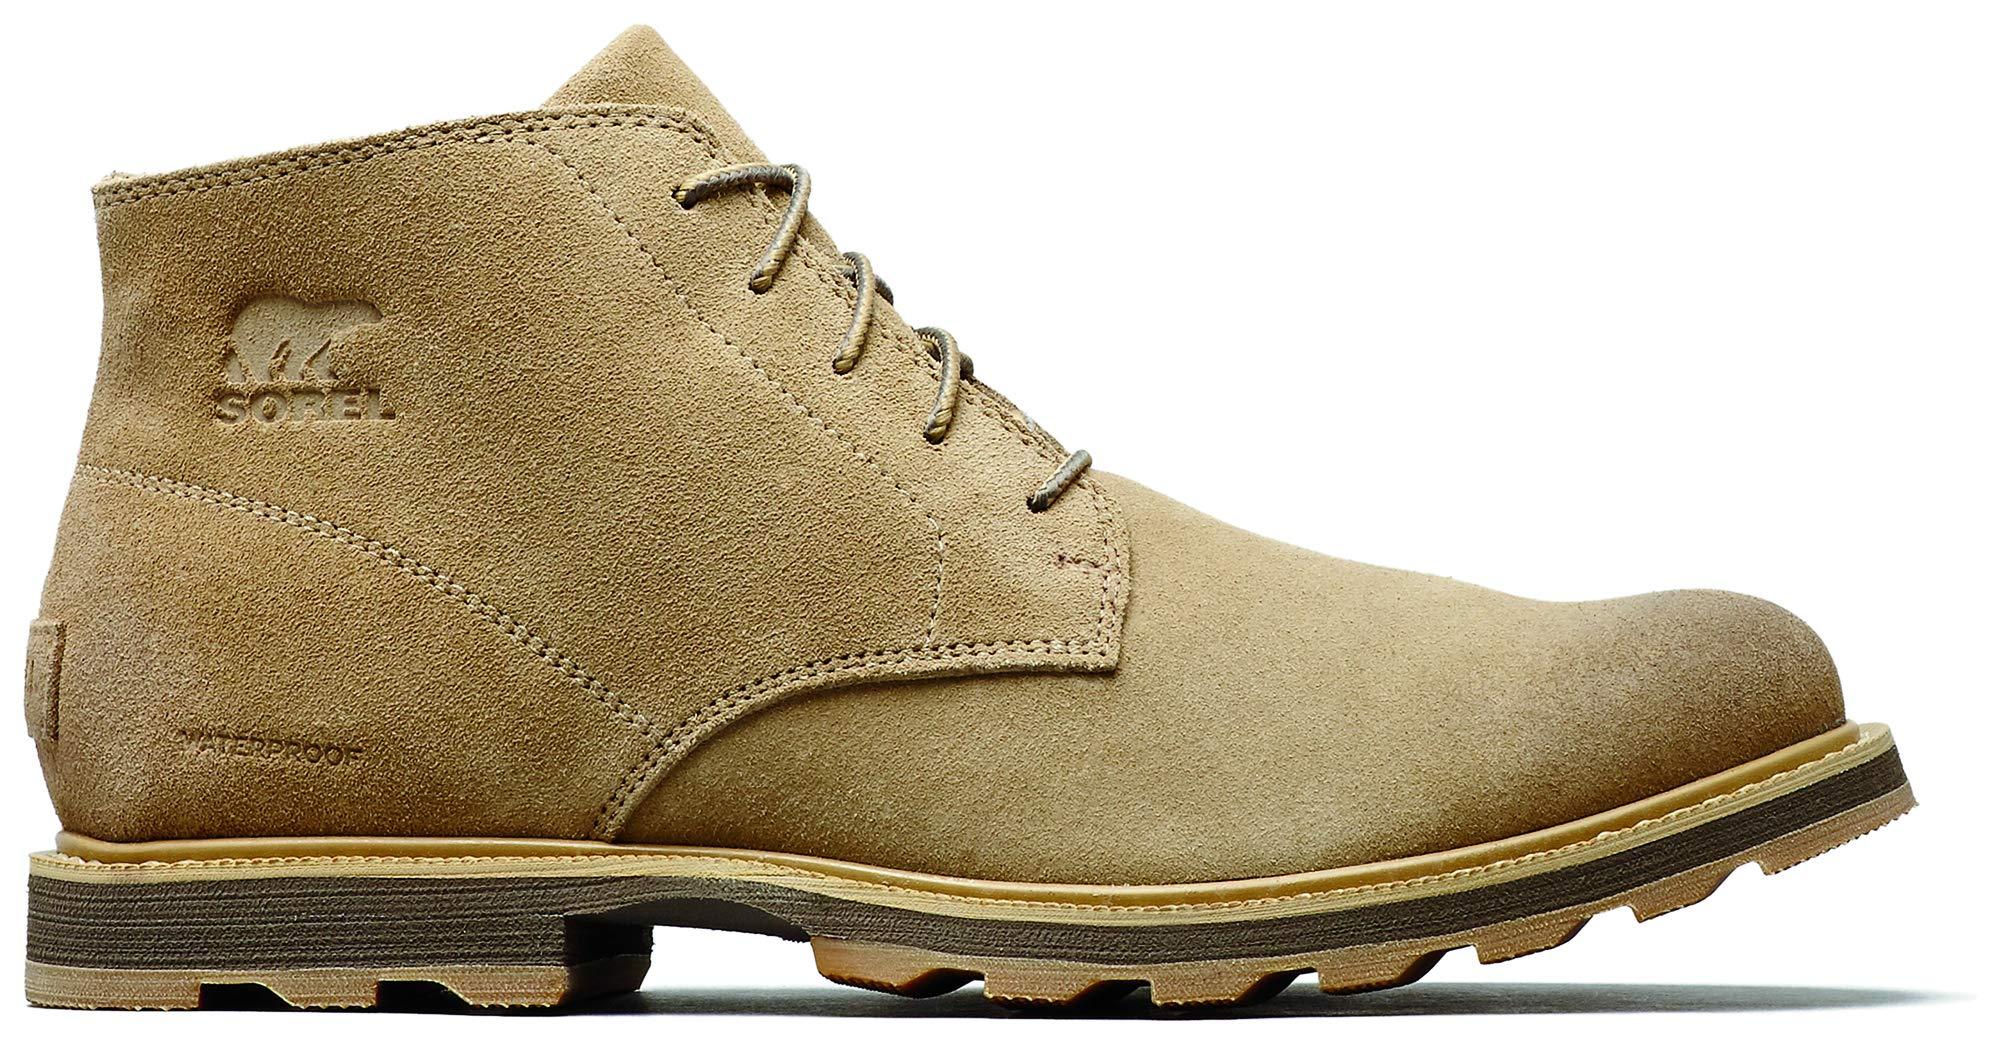 SOREL Madson Chukka Waterproof Boot - Men's Crouton, 10.5